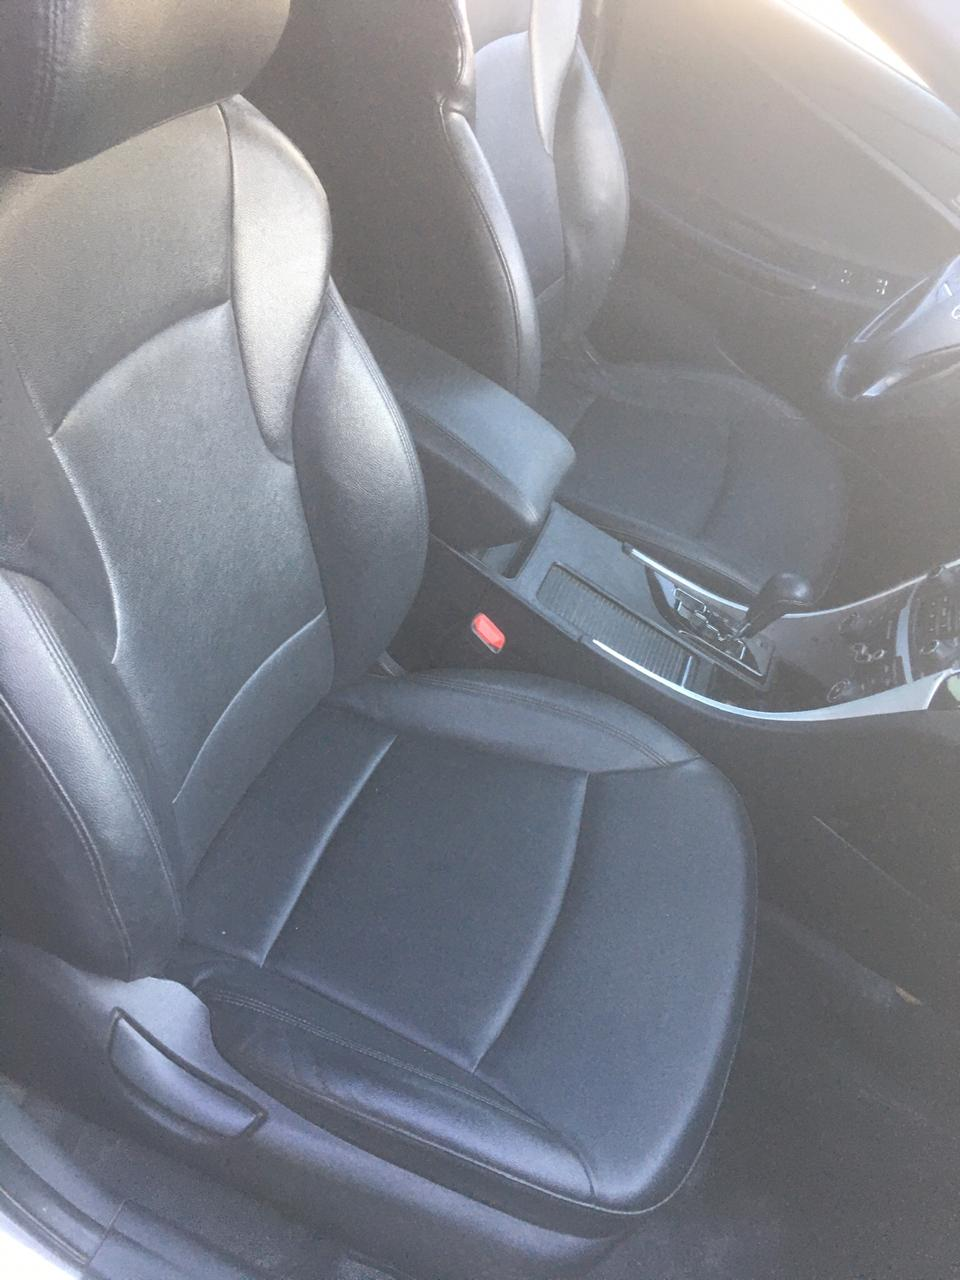 Hyundai Sonata 2.0(lt) 2011 İkinci əl  $19700